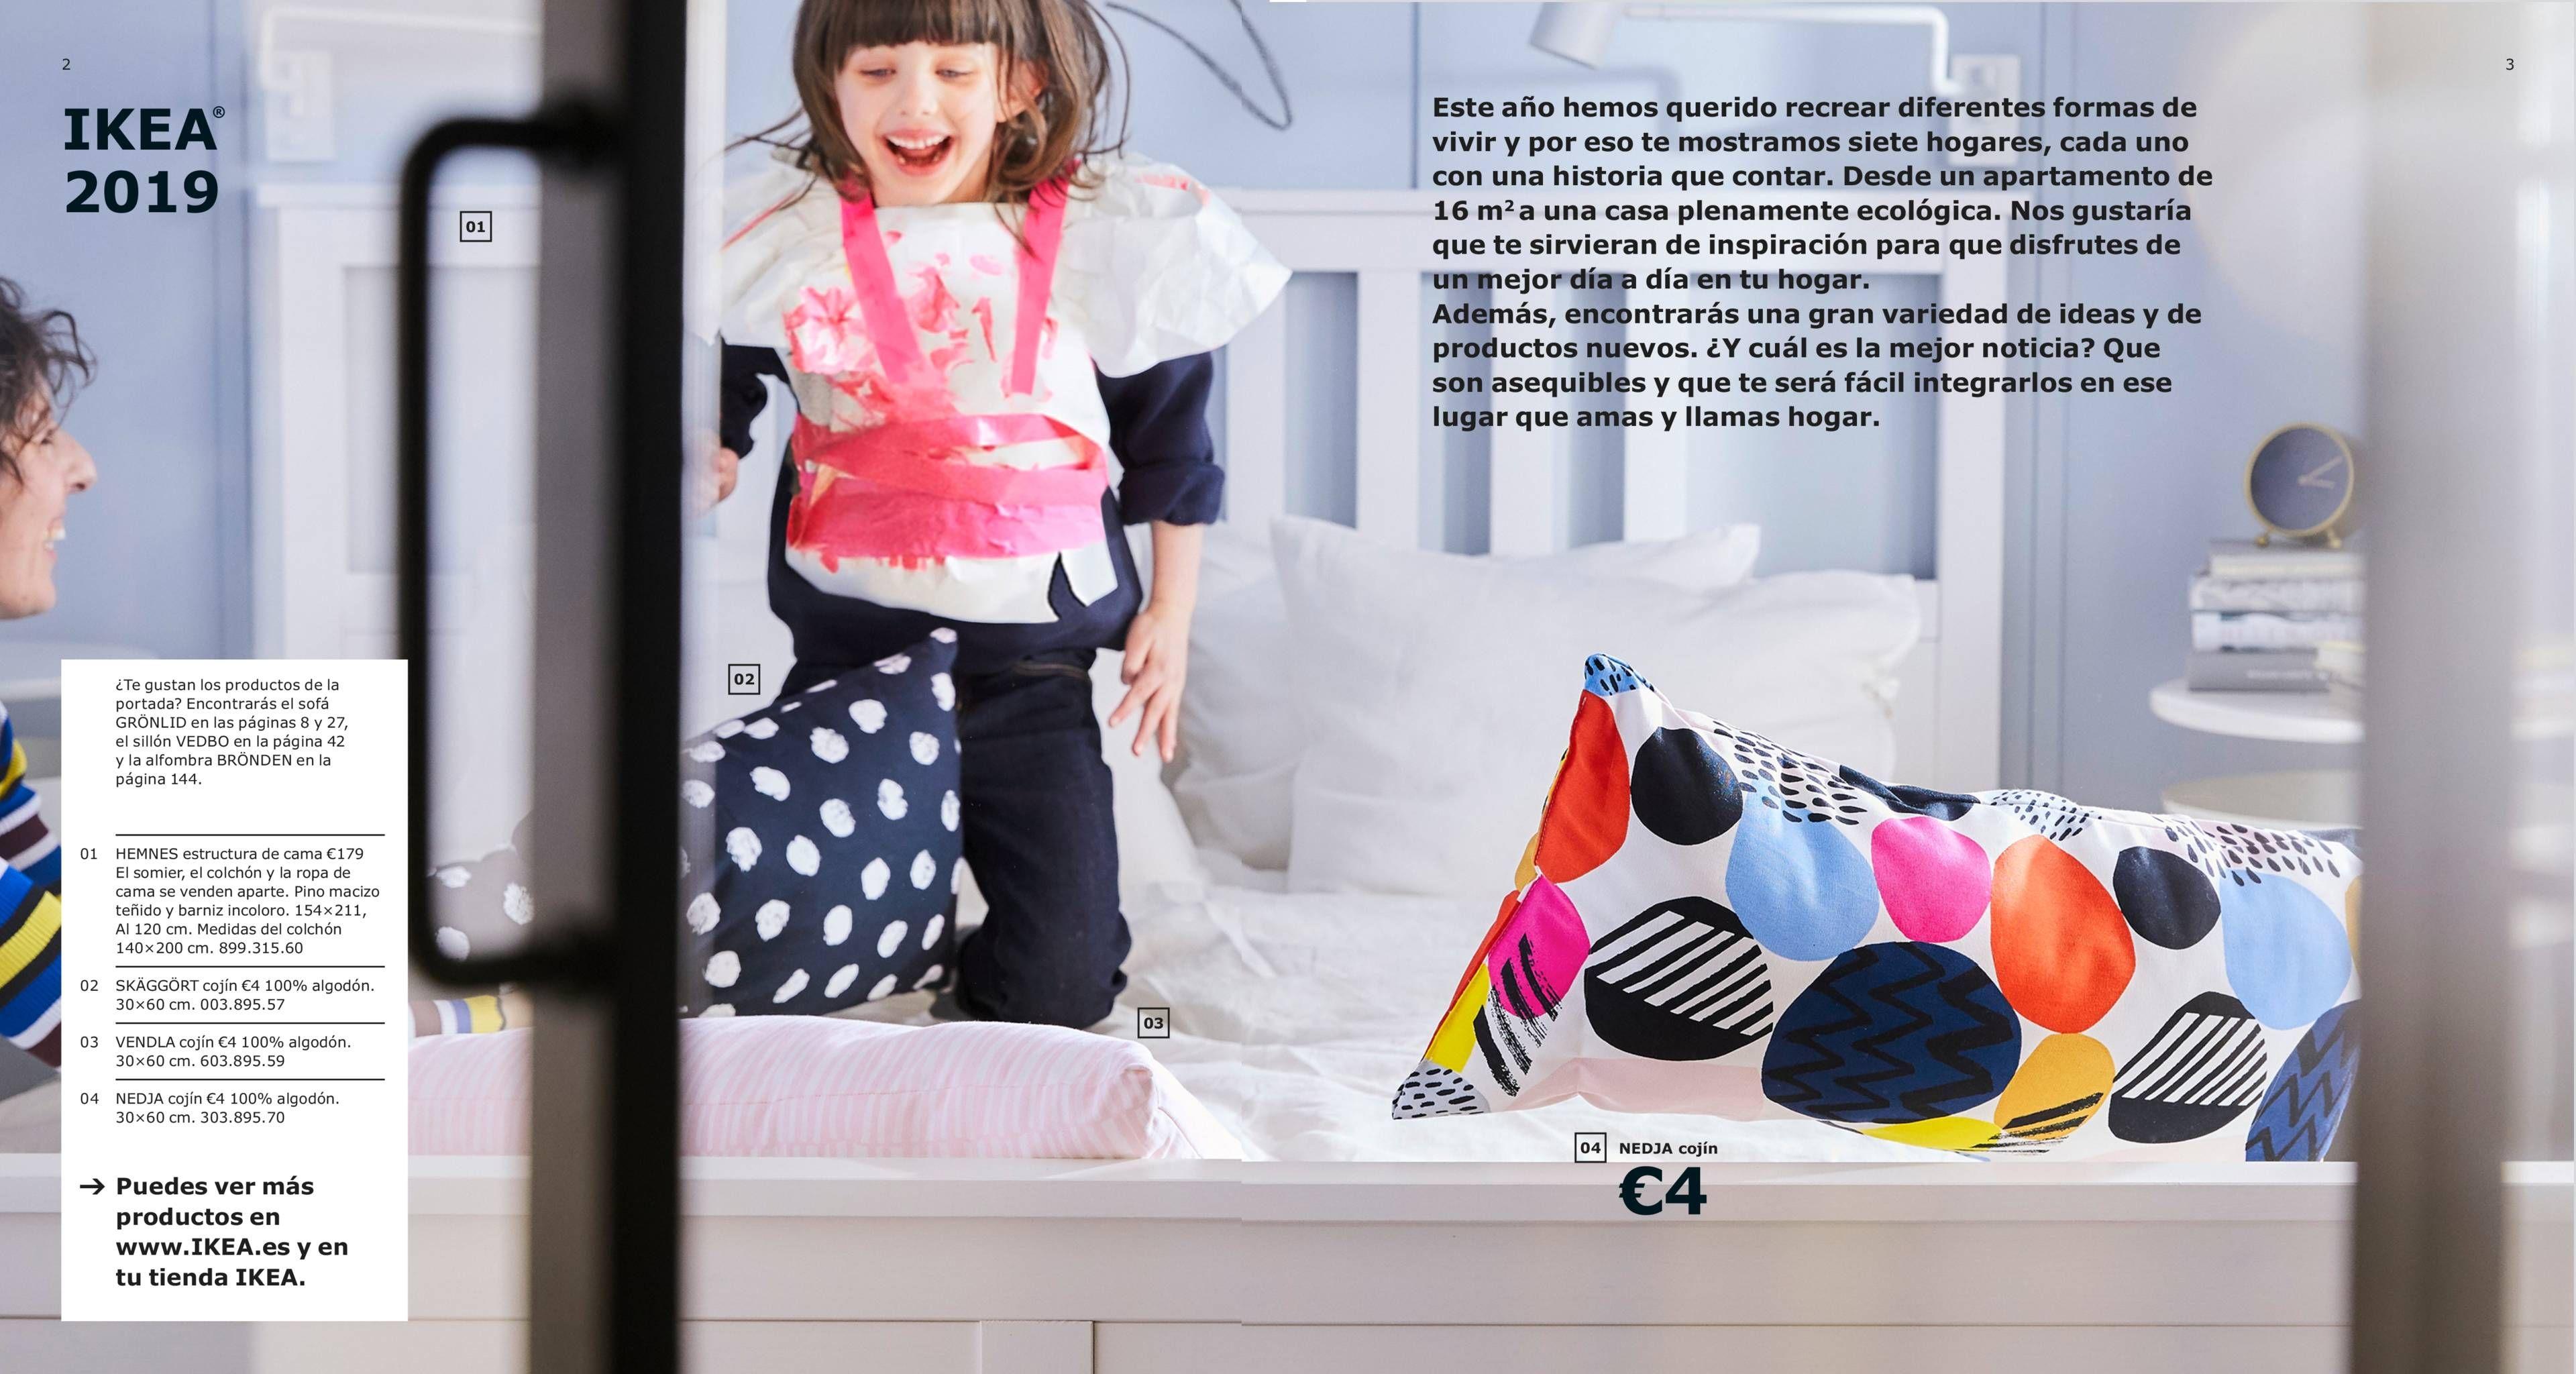 f0735fdb788 IKEA catalogue 2019 - CATÁLOGO 2019   catálogo ikea   Ikea, Ikea usa ...